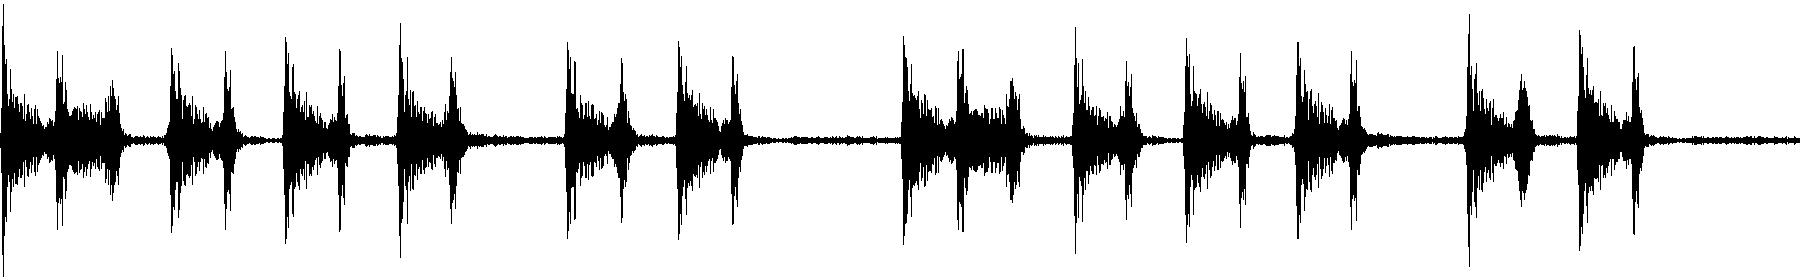 vfh1 125bpm minimalsau melody 1